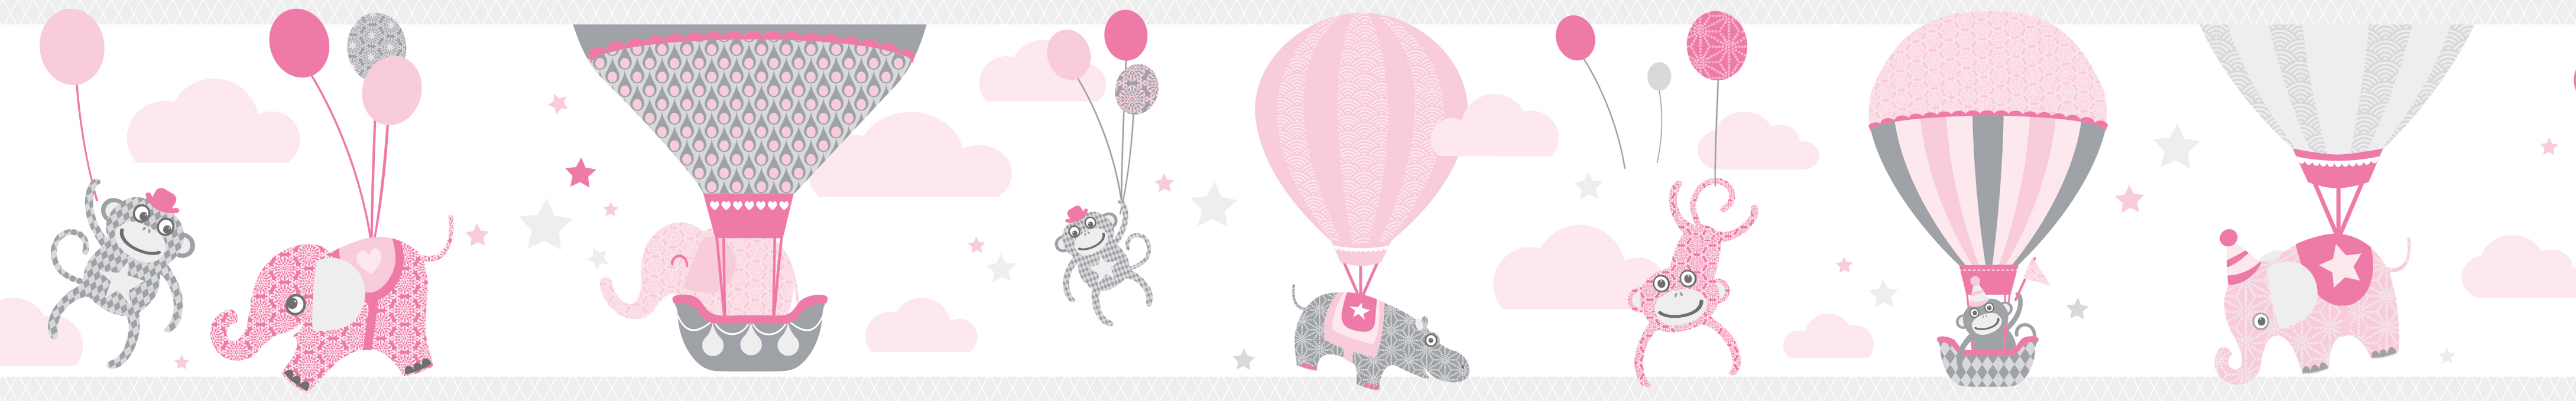 Selbstklebende Bordure Hot Air Balloons Heissluftballons Rosa